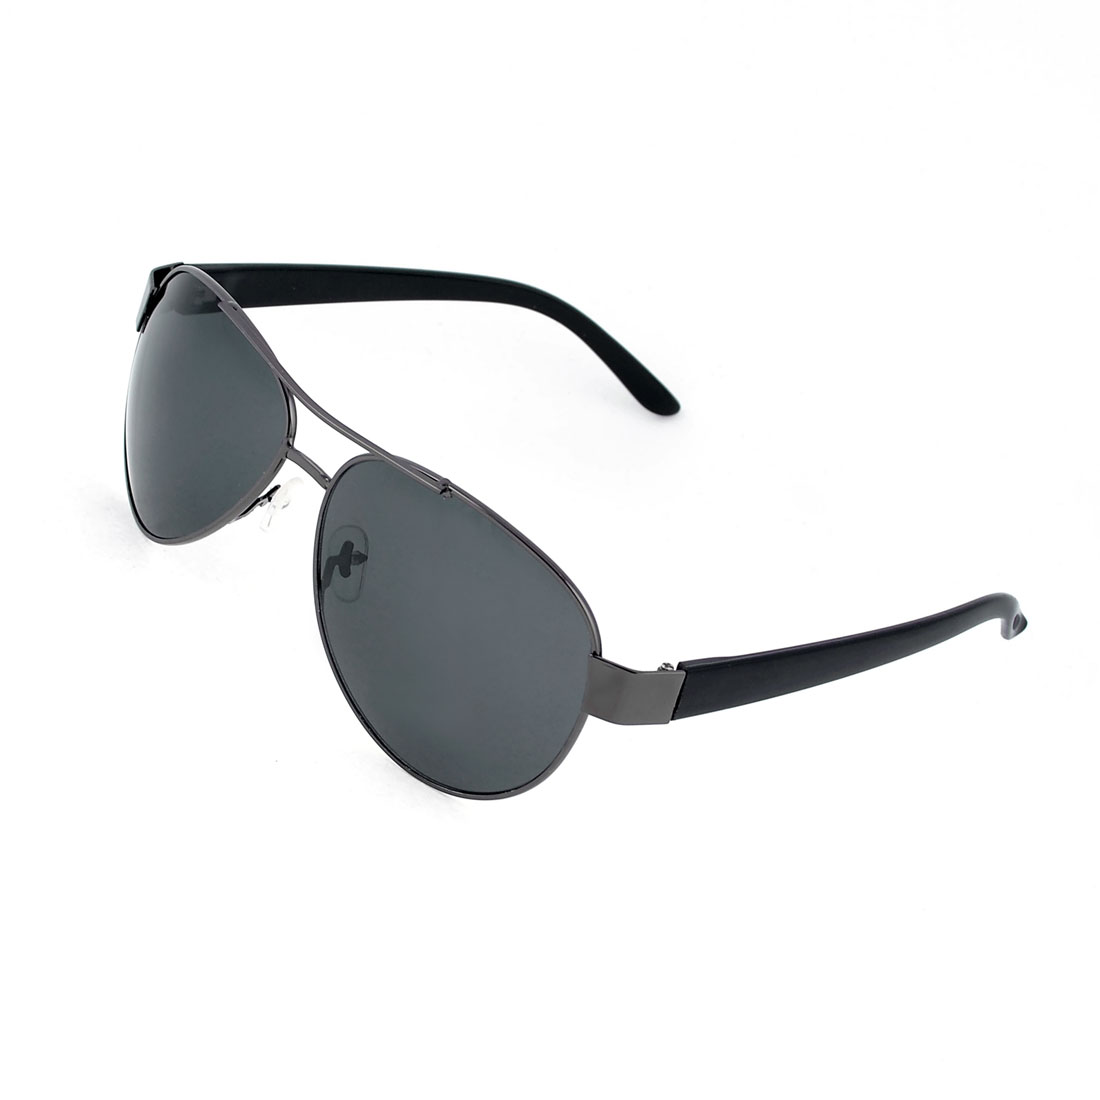 Man Fishing Camping Metal Rim Black Lens Plastic Arms Eyes Protective Sunglasses